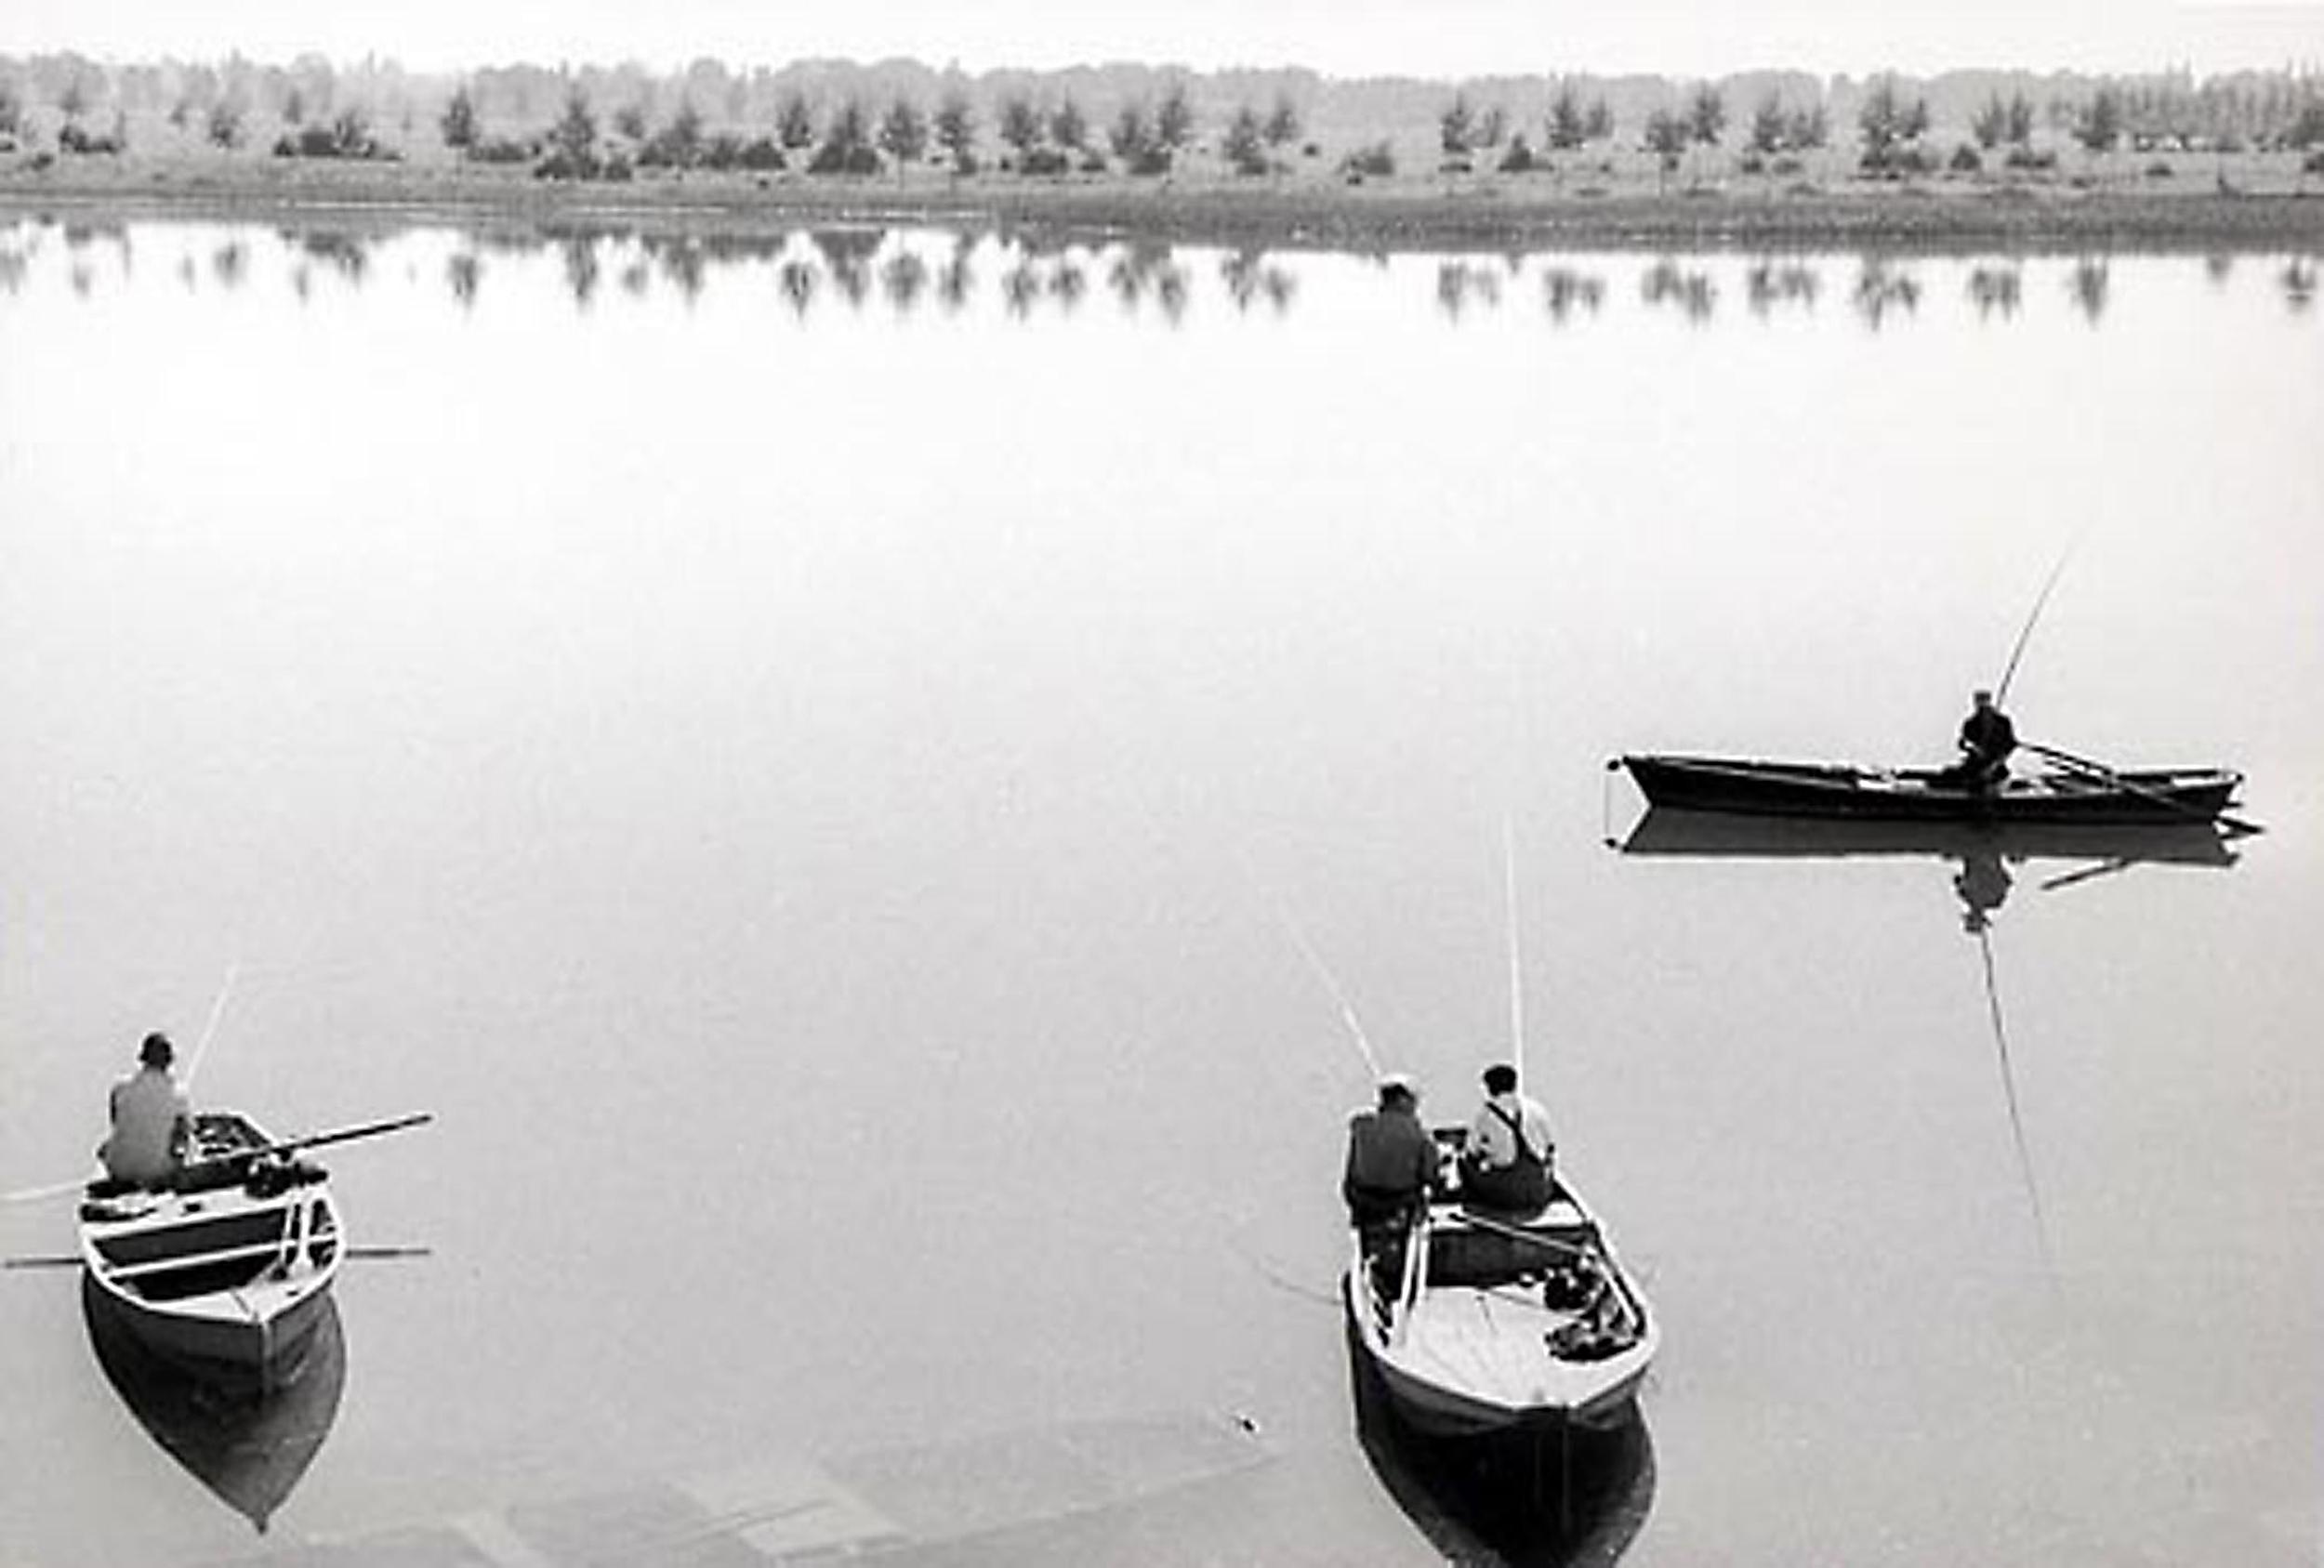 HANNON_fishing_near_lyon_(france)_1956_p11x14_high.jpg